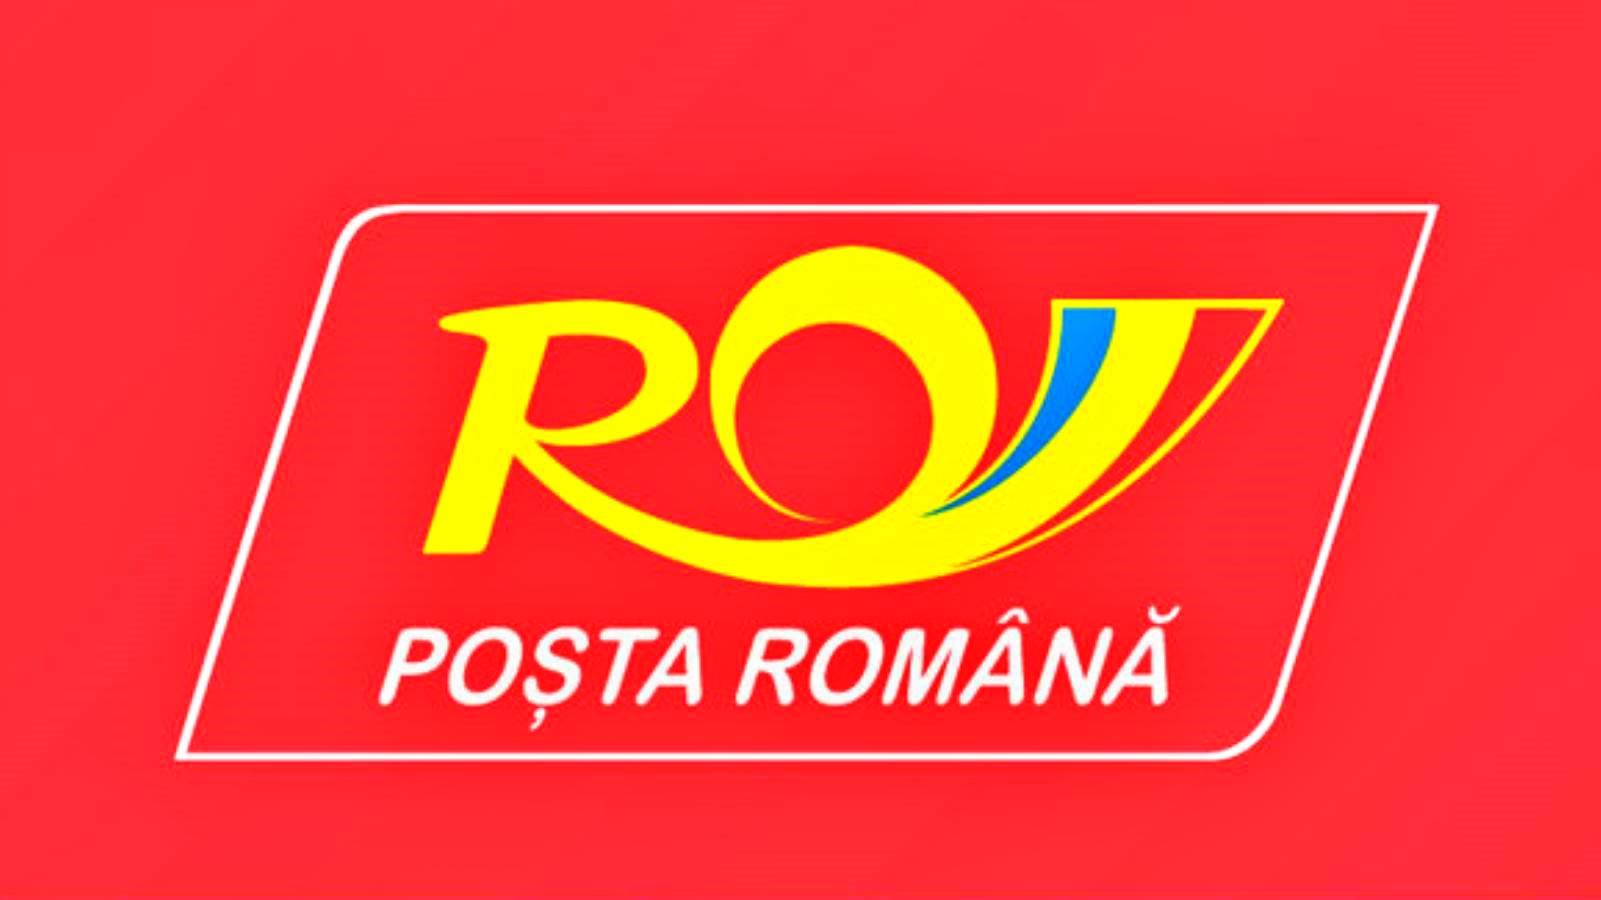 Posta Romana Mesajul Oficial care Vizeaza Clientii Romani